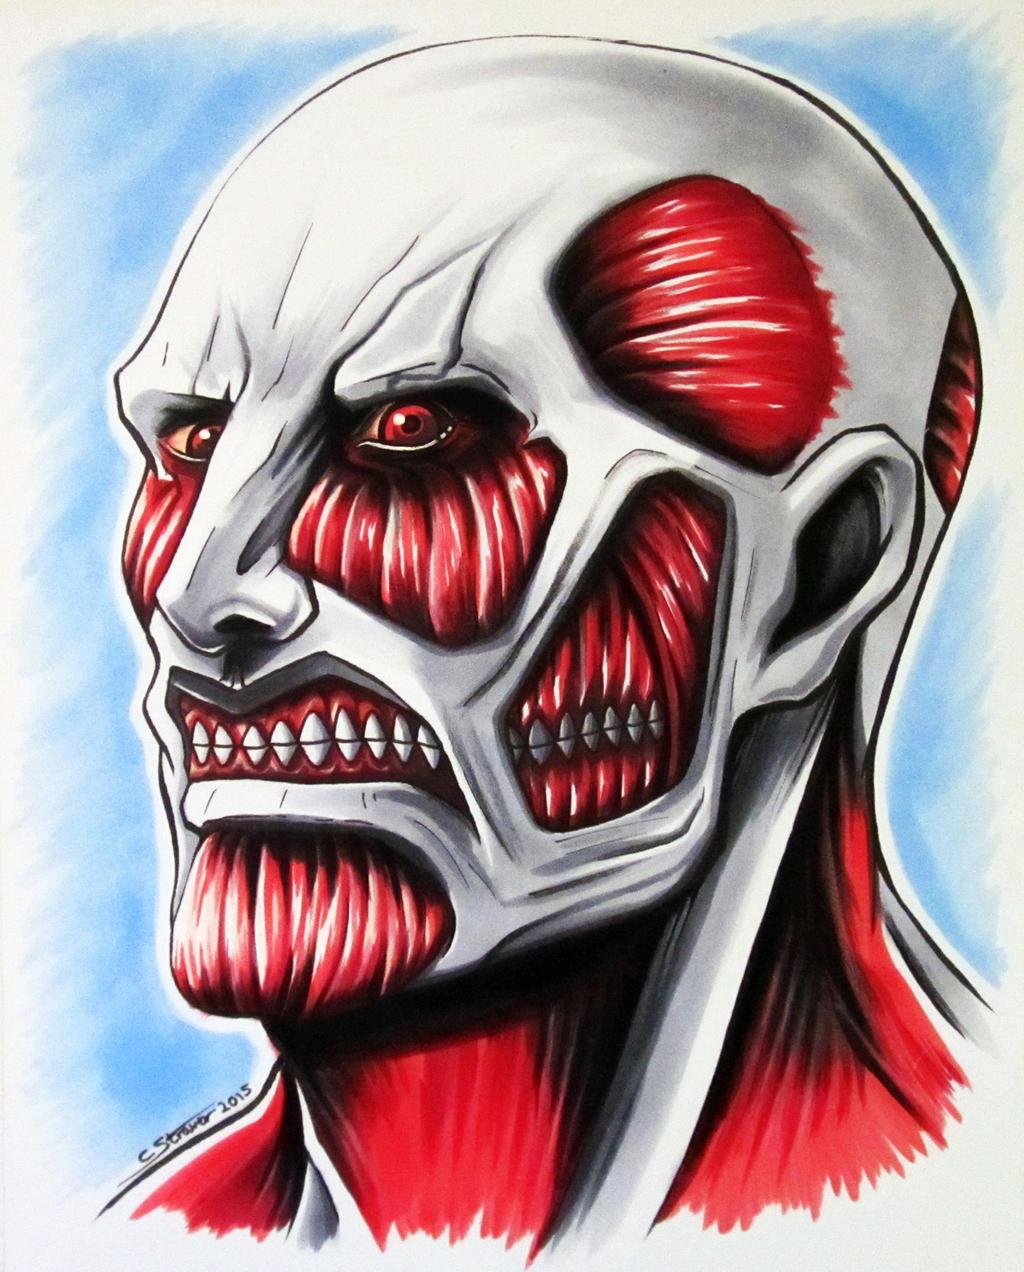 Attack On Titan Fan Art By LethalChris On